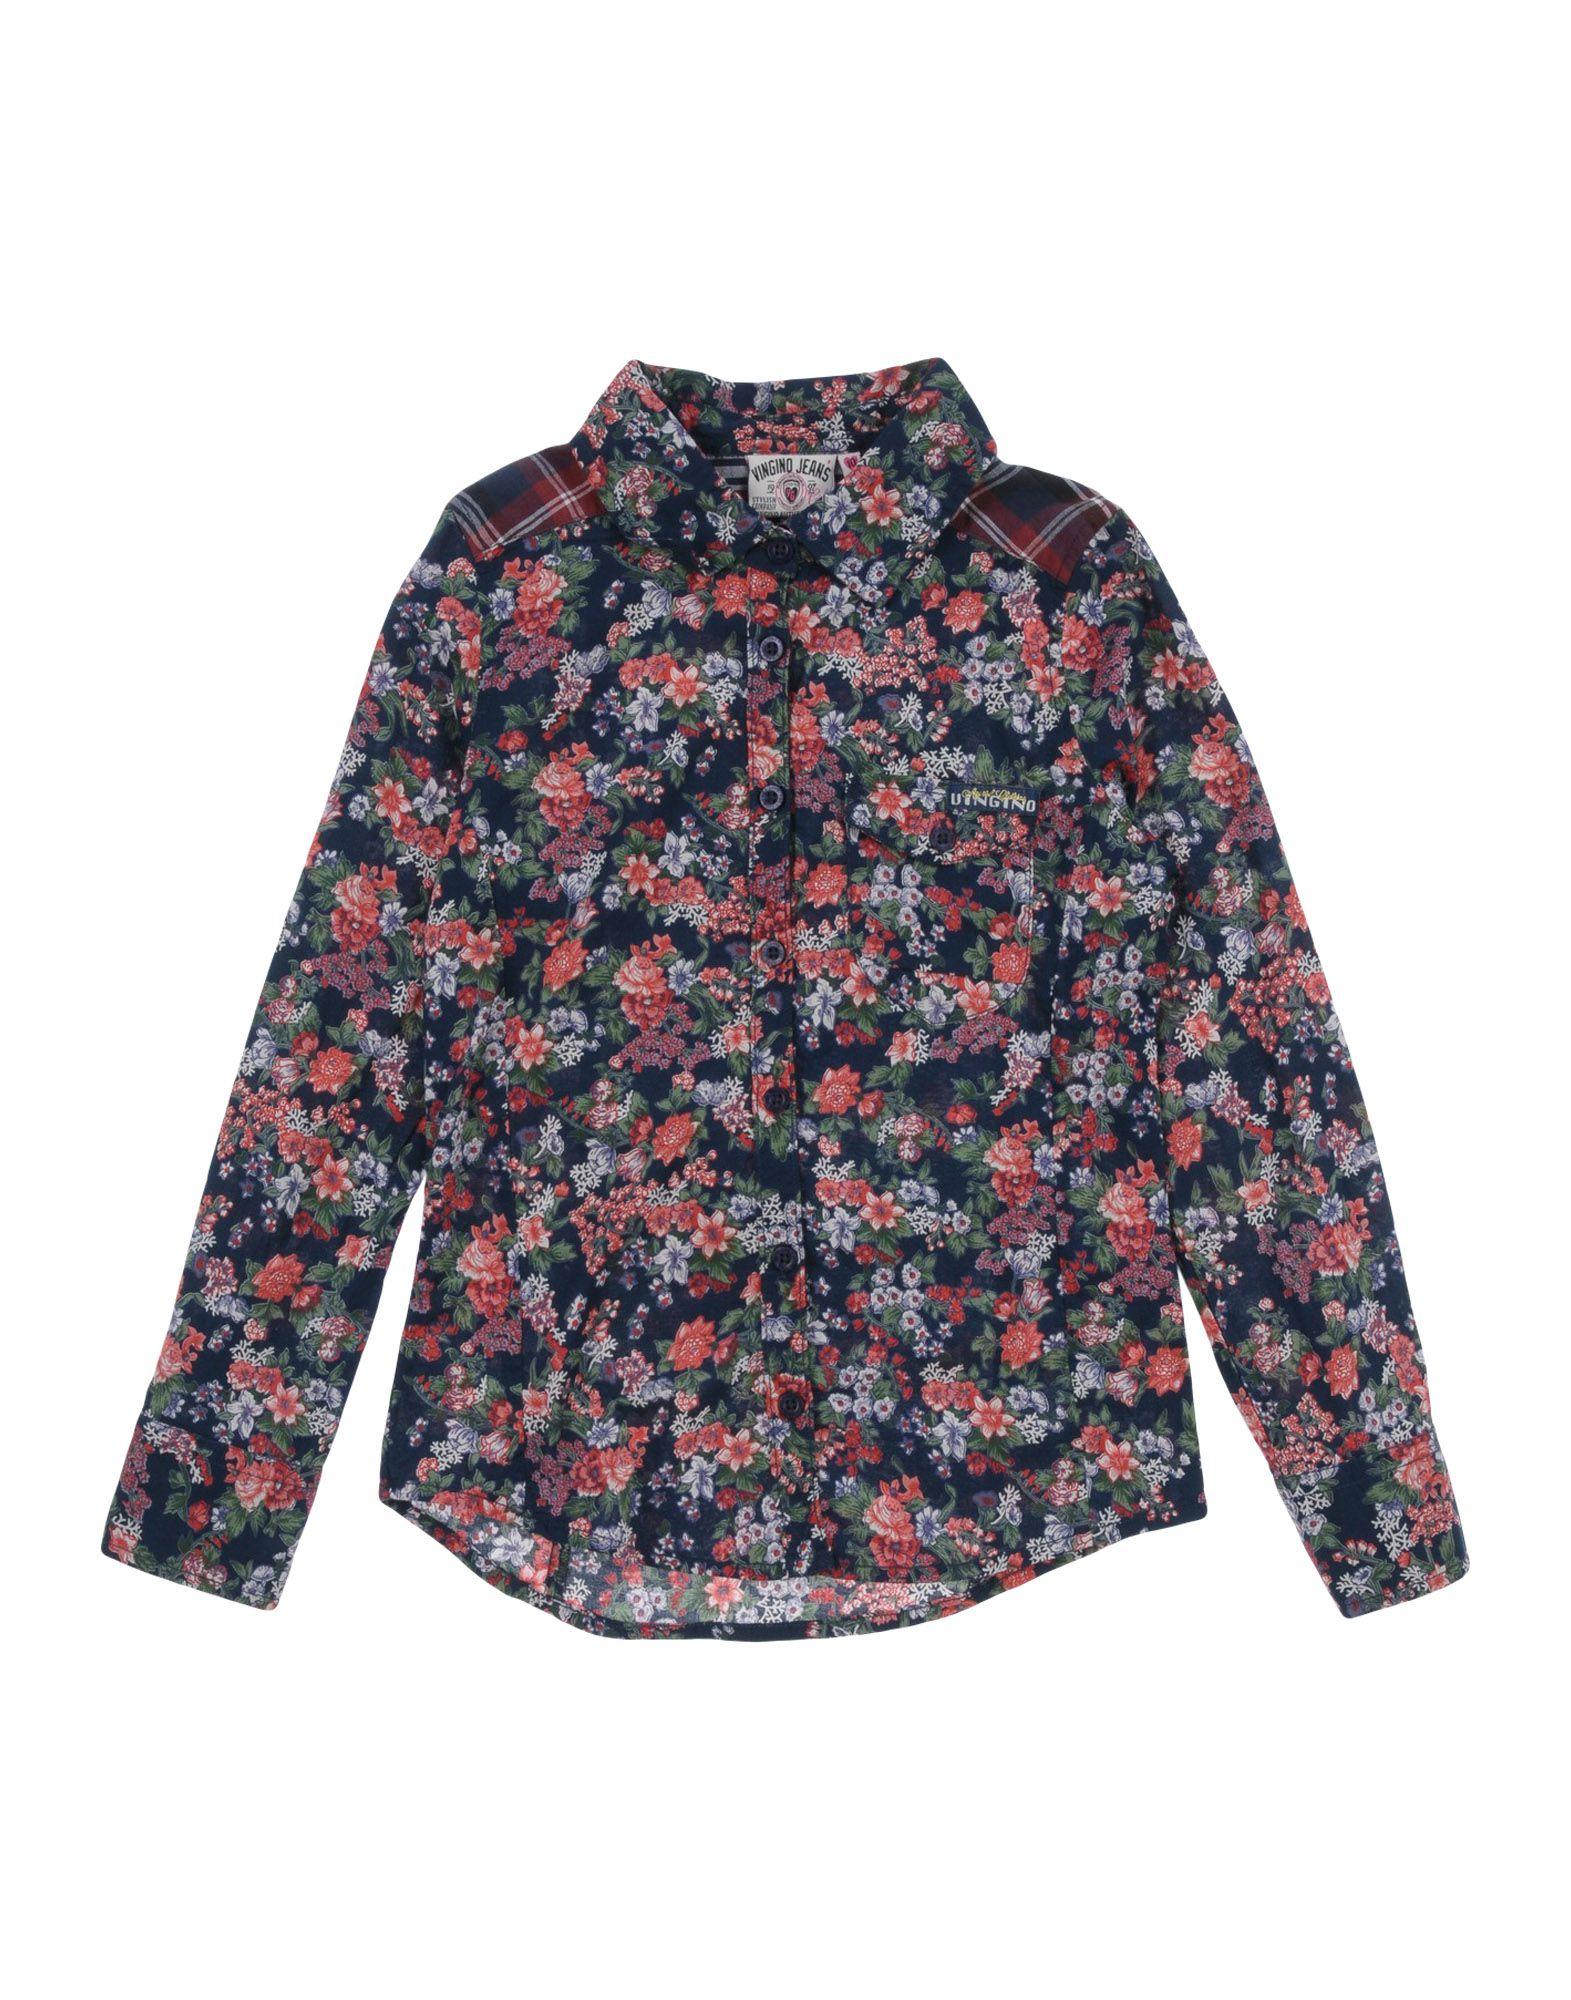 VINGINO Floral Shirts & Blouses in Dark Blue